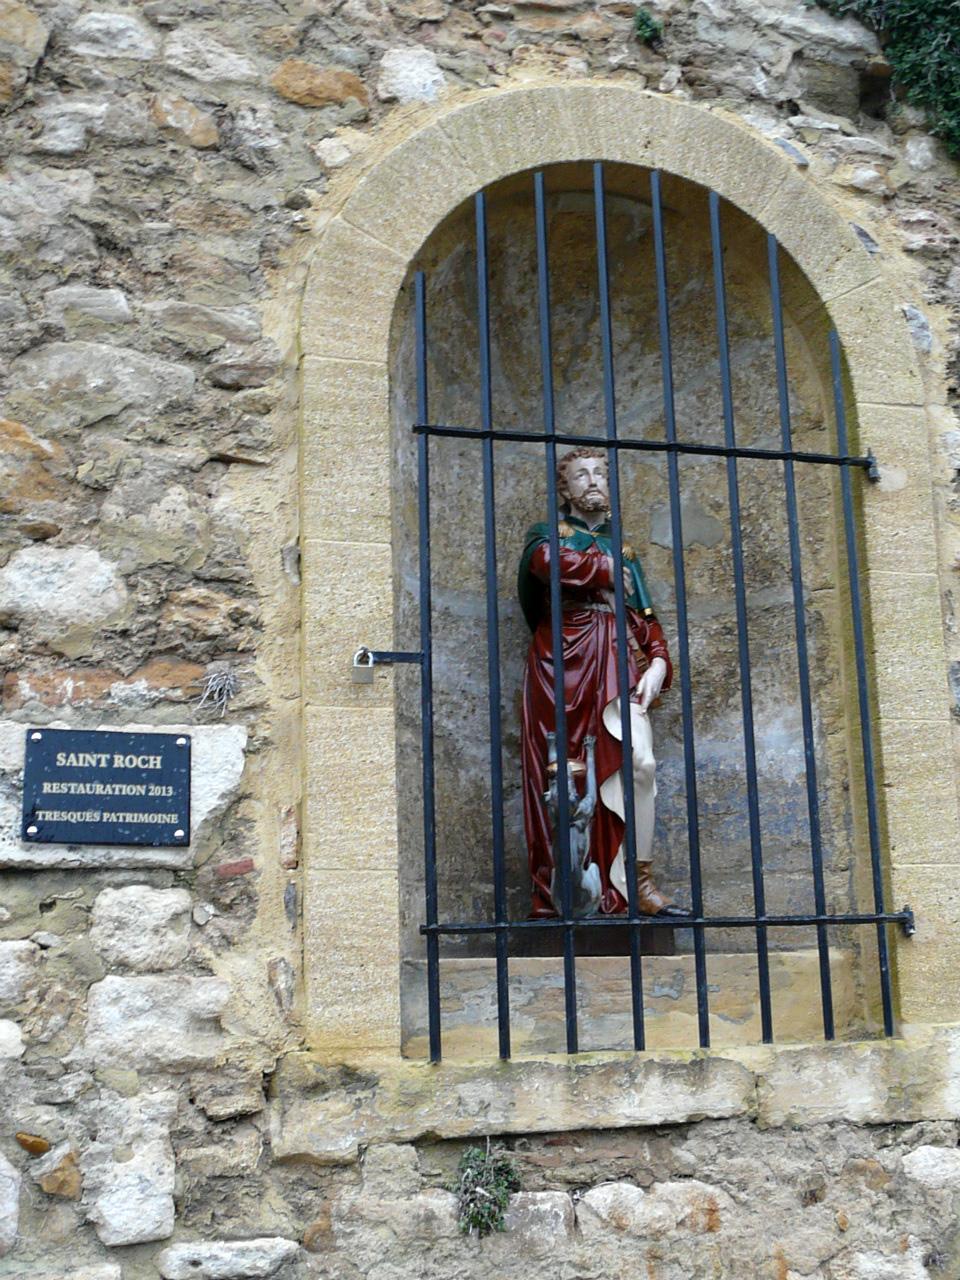 Inauguration de la Statue de Saint Roch